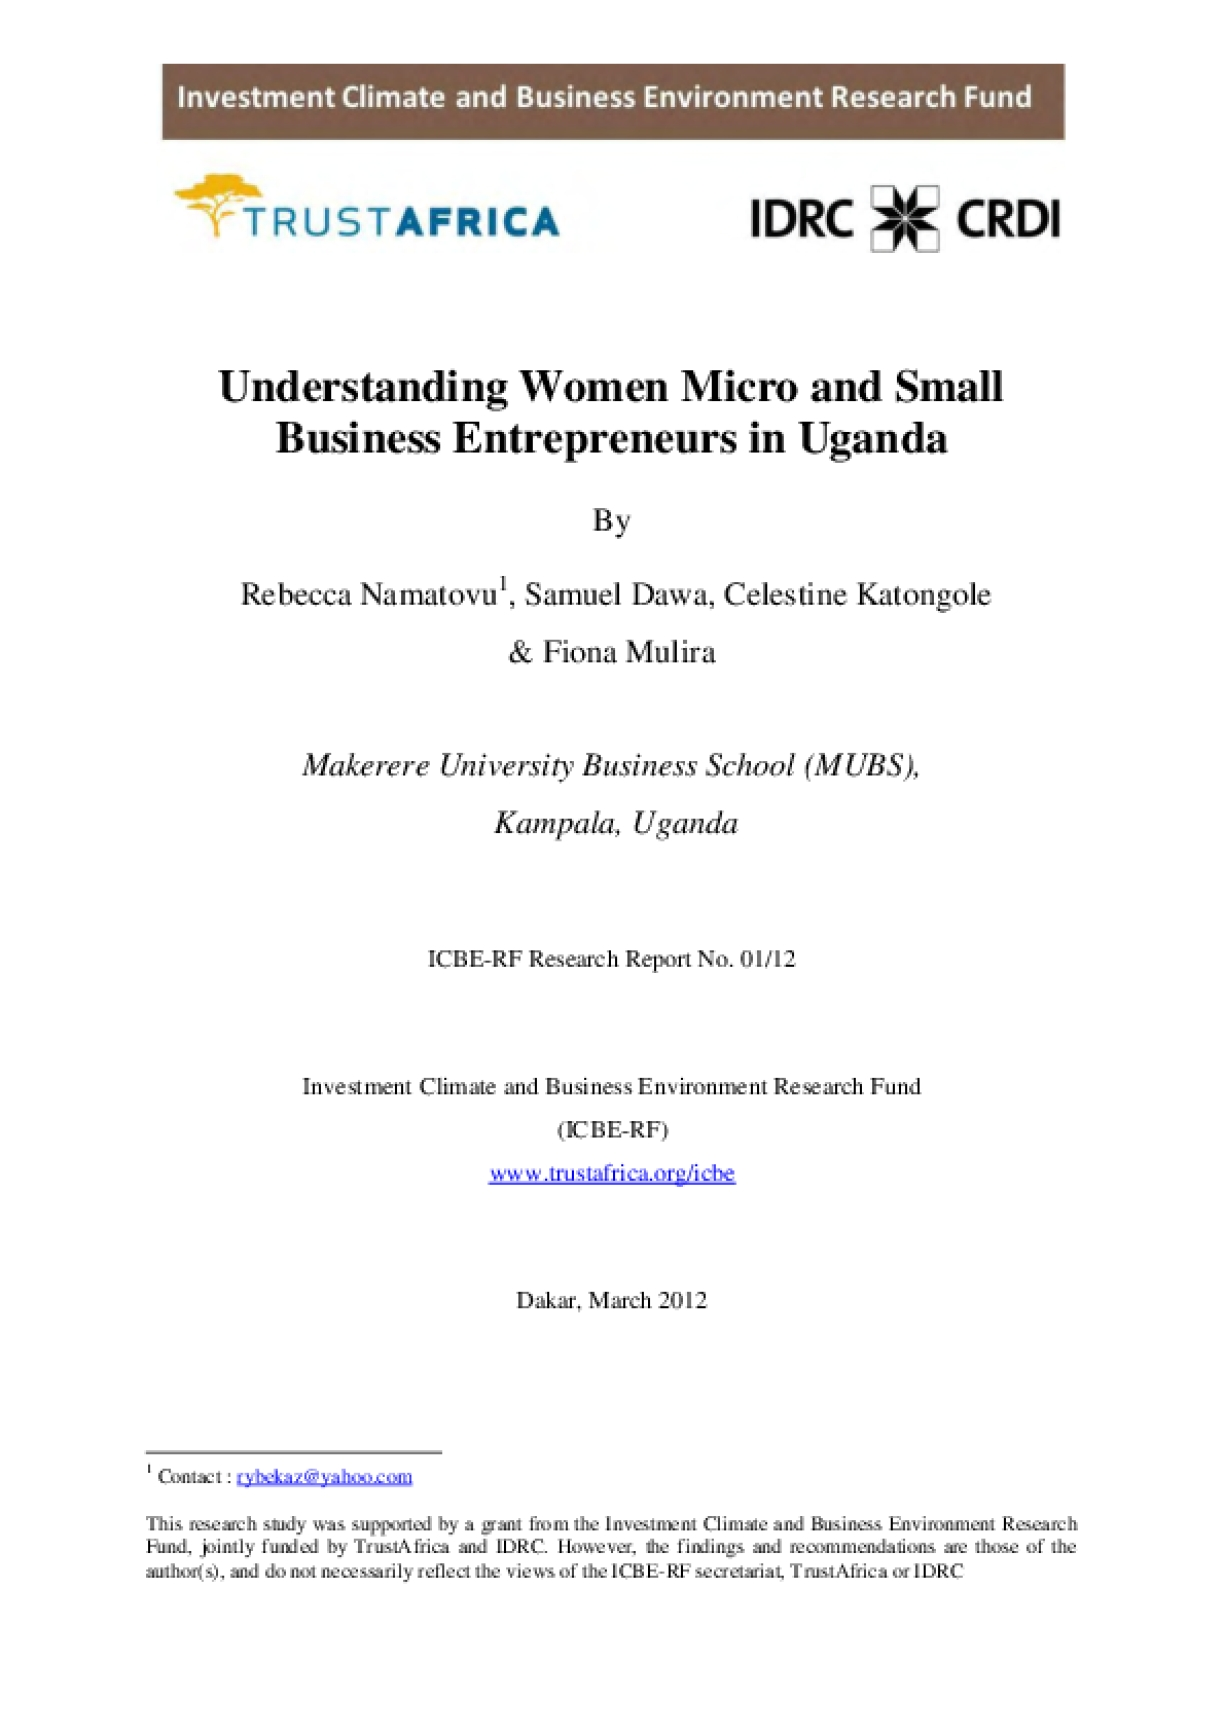 Understanding Women Micro and Small Business Entrepreneurs in Uganda